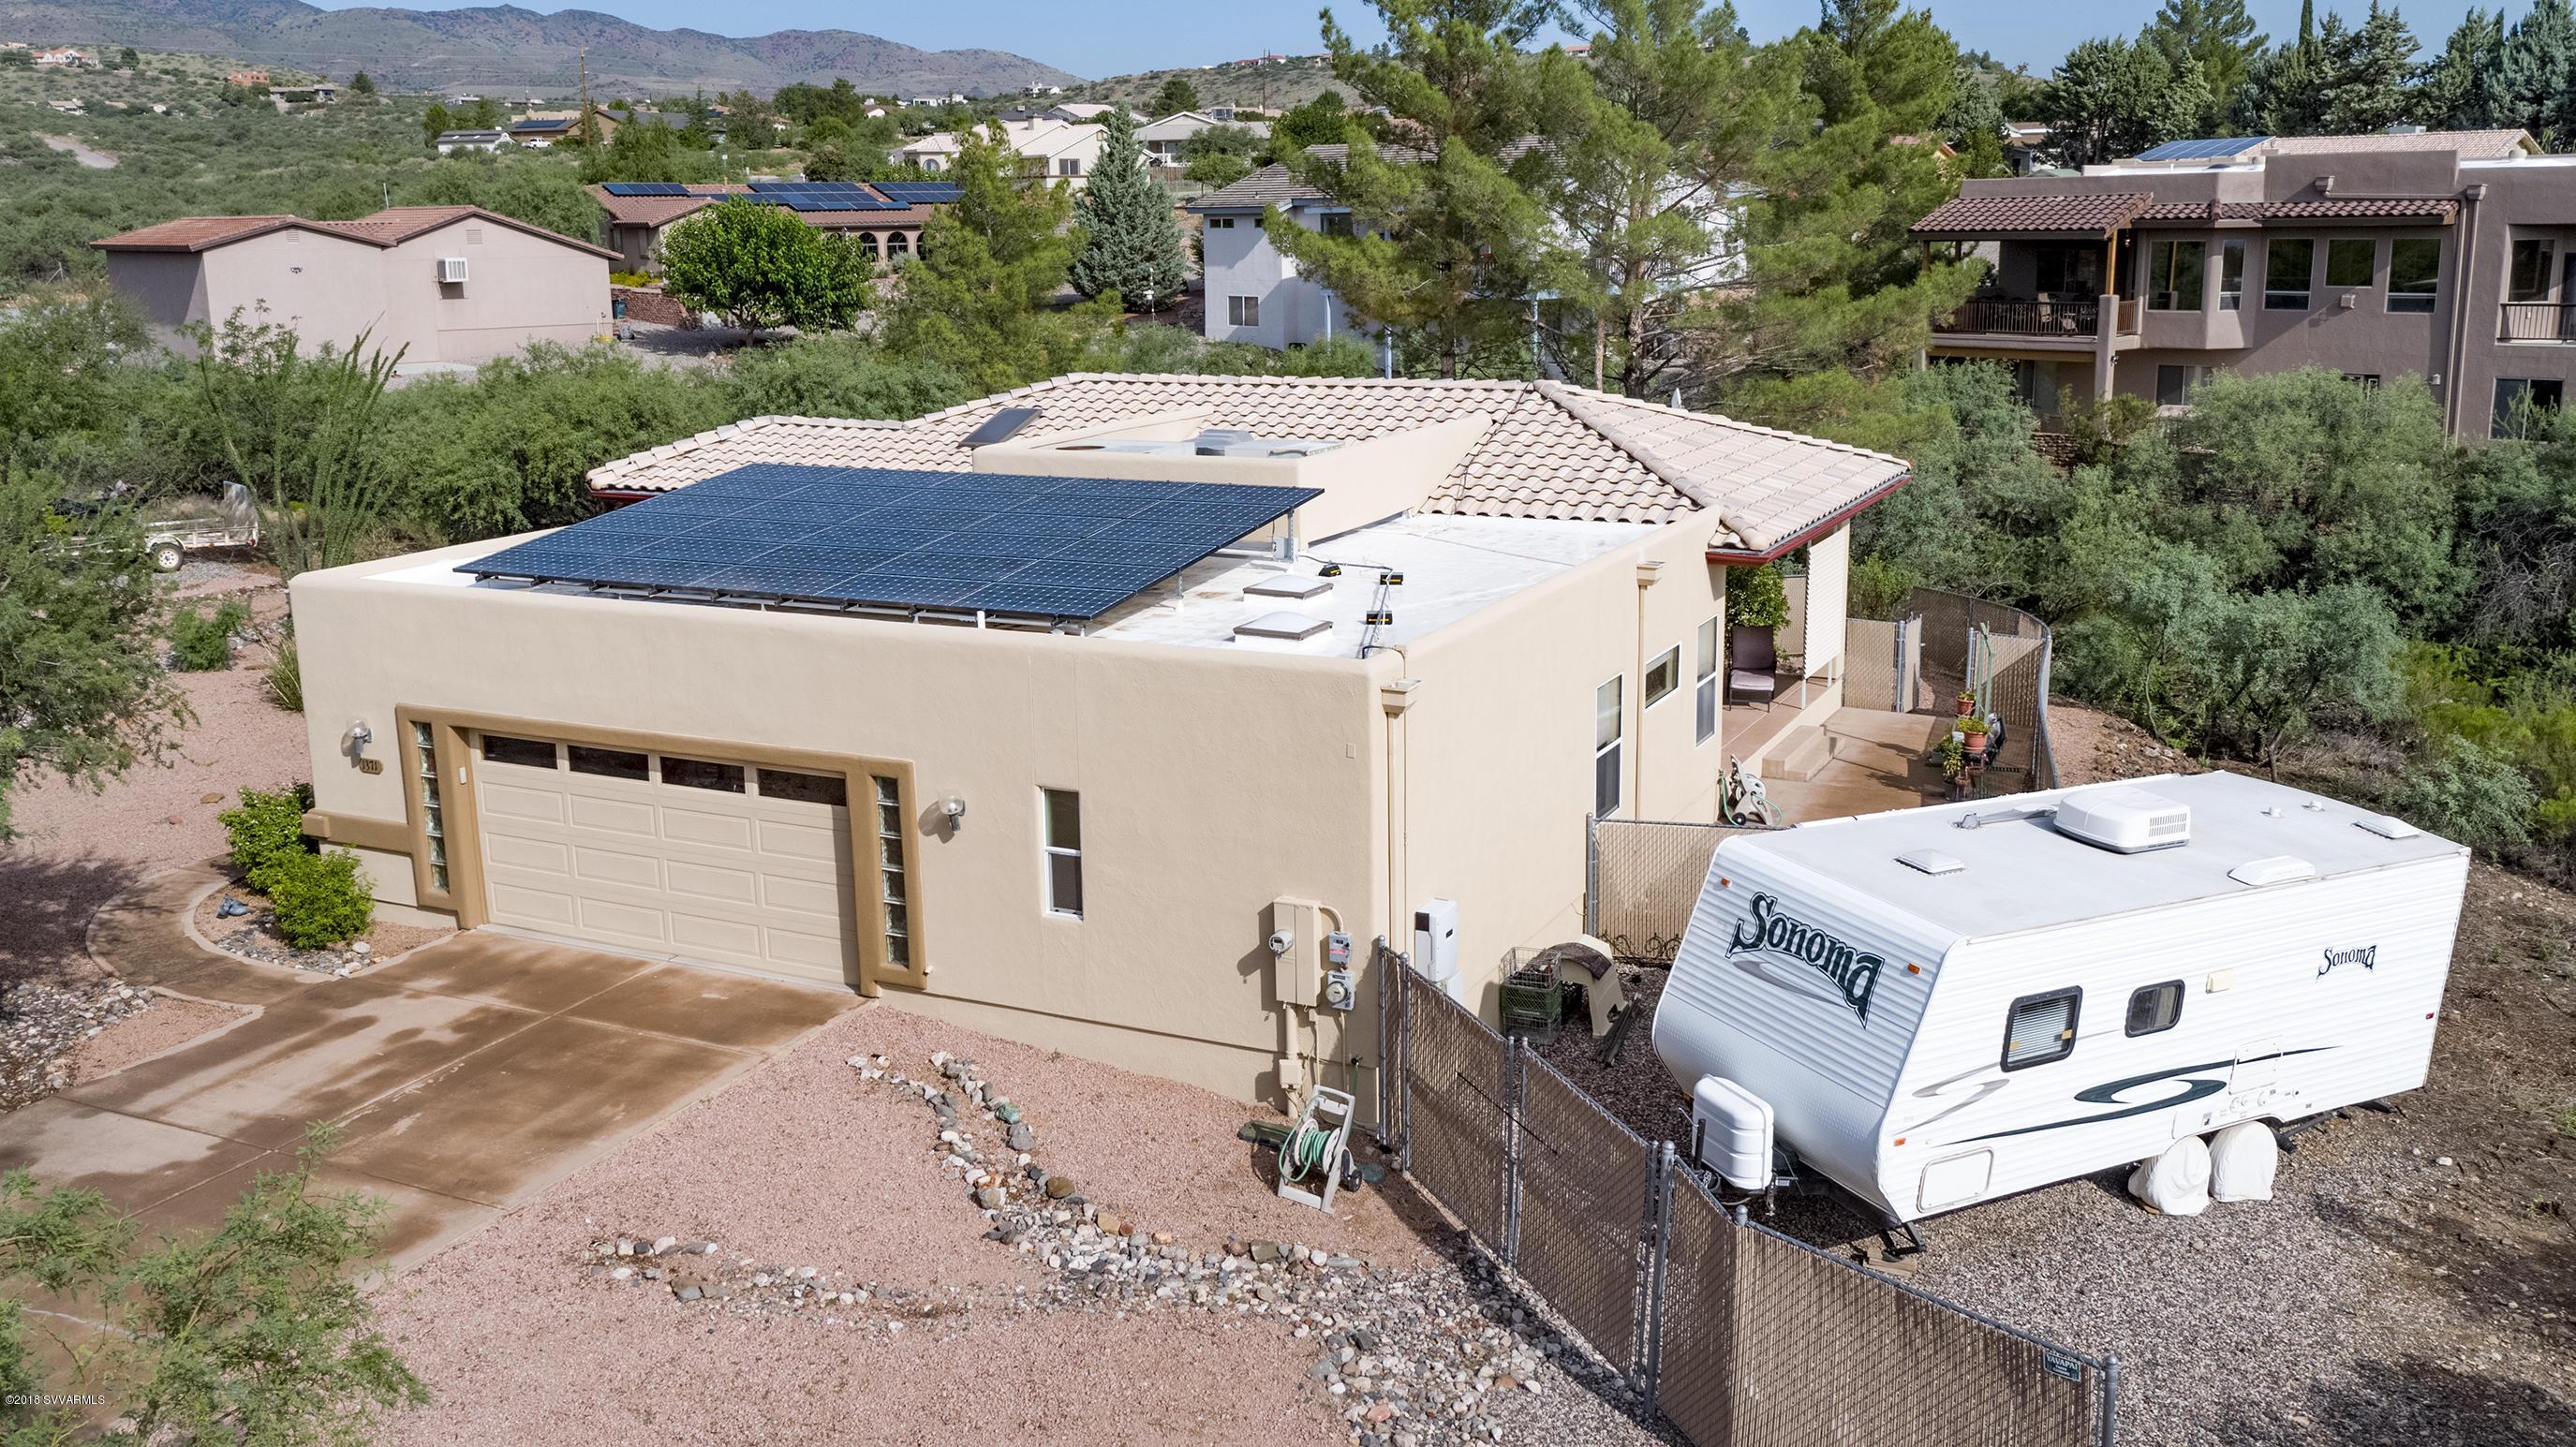 1371 Old Jerome Hwy Clarkdale, AZ 86324